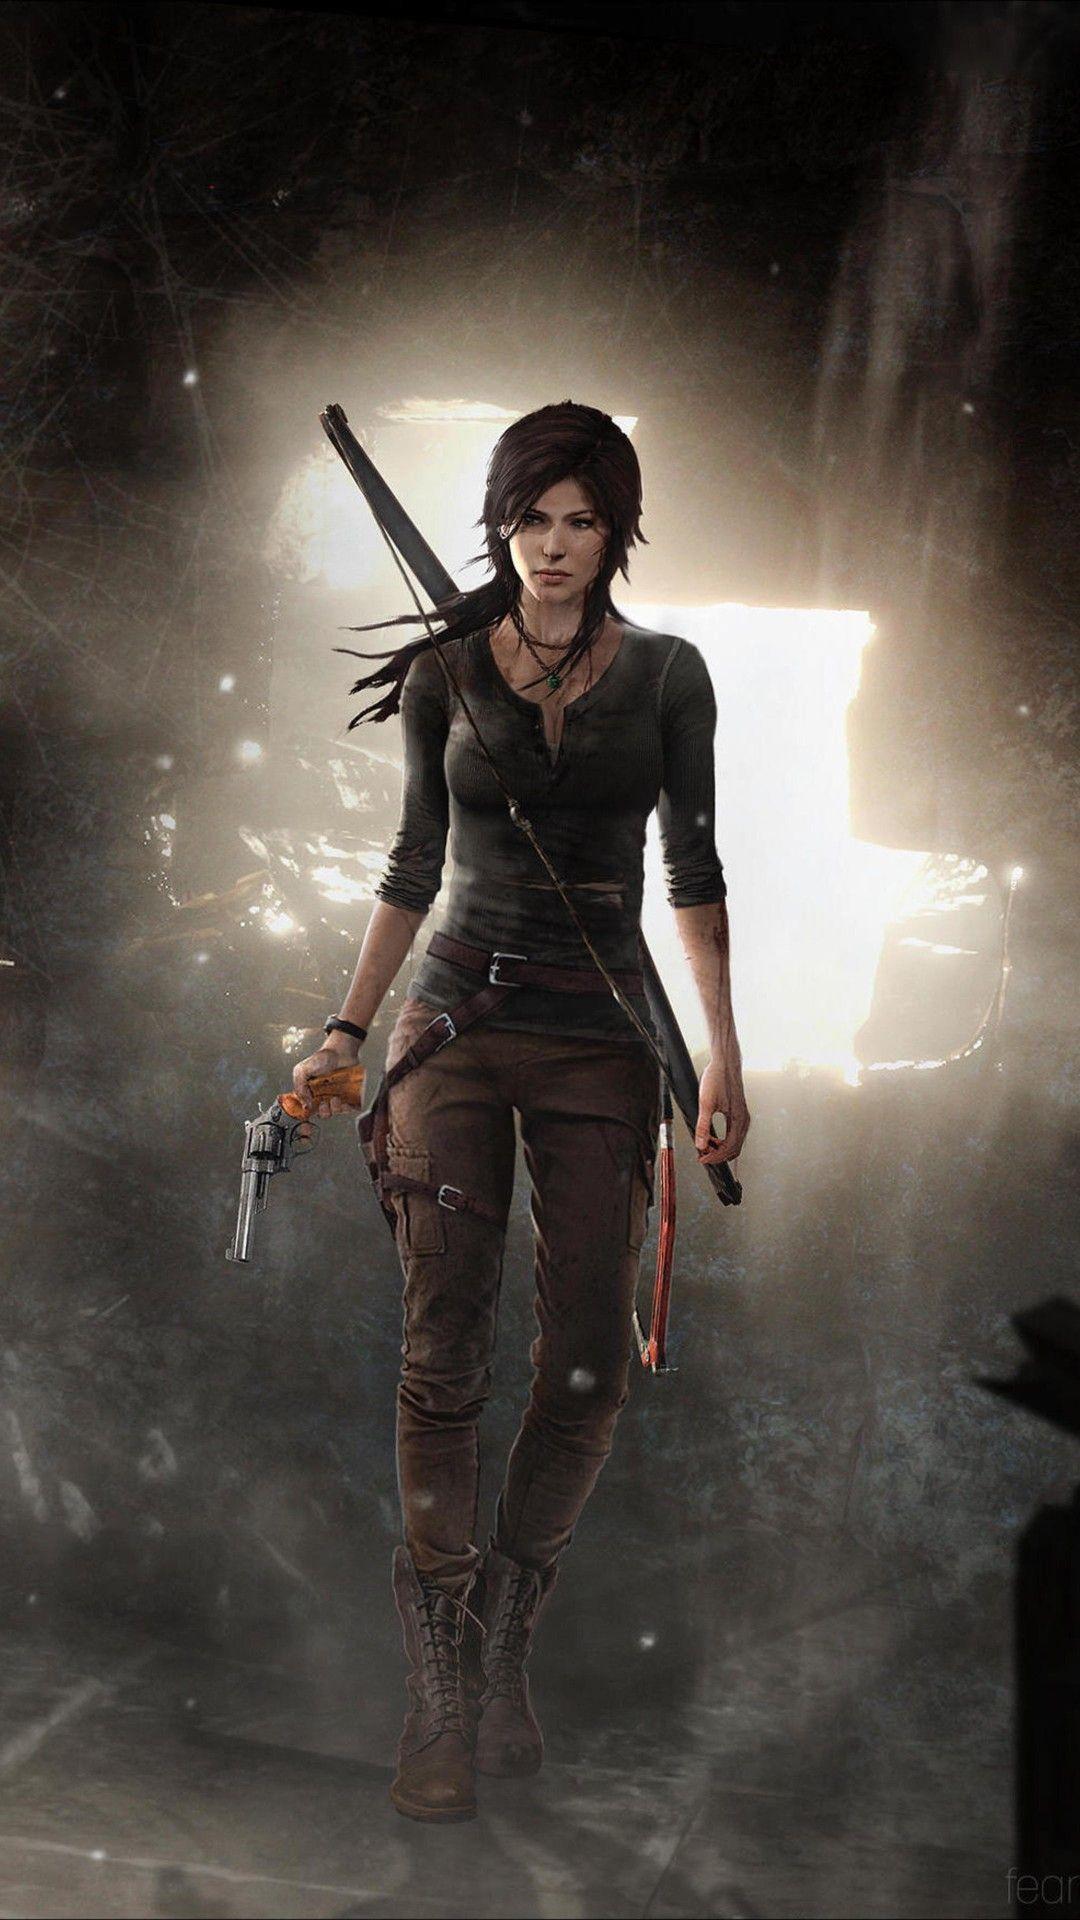 Lara Croft Hd Wallpaper Laracroft Lara Croft Wallpaper Tomb Raider Game Tomb Raider Cosplay